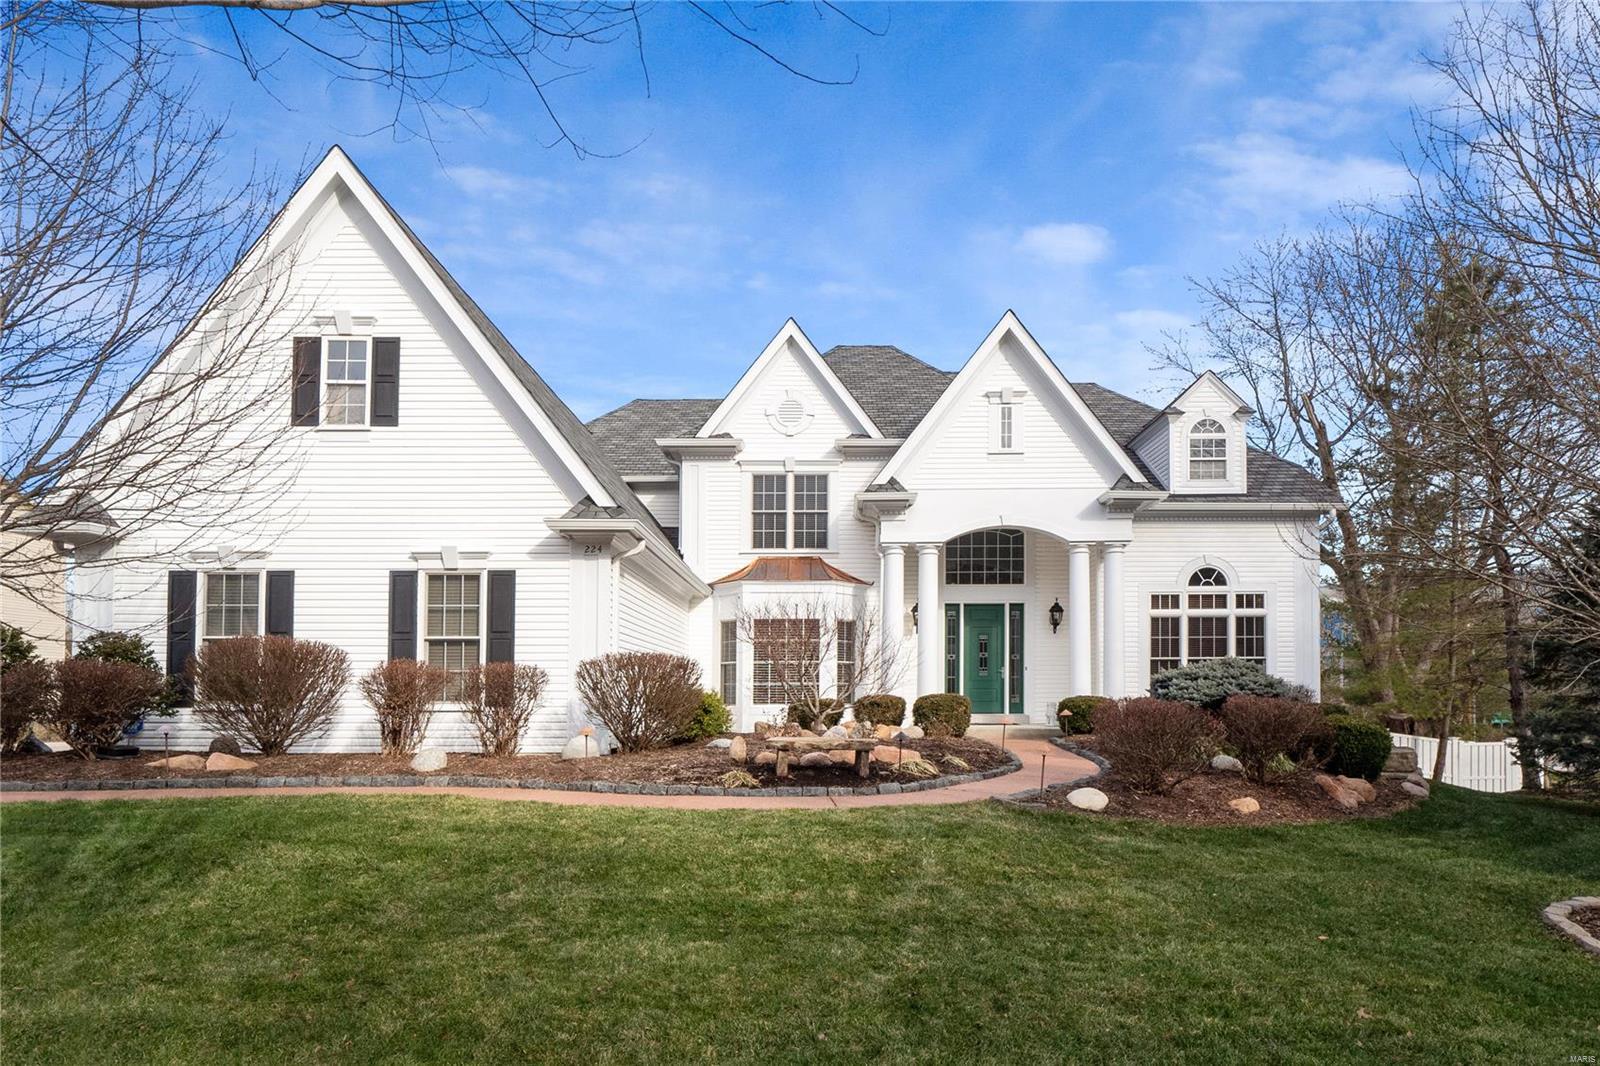 Appaloosa Way Real Estate Listings Main Image